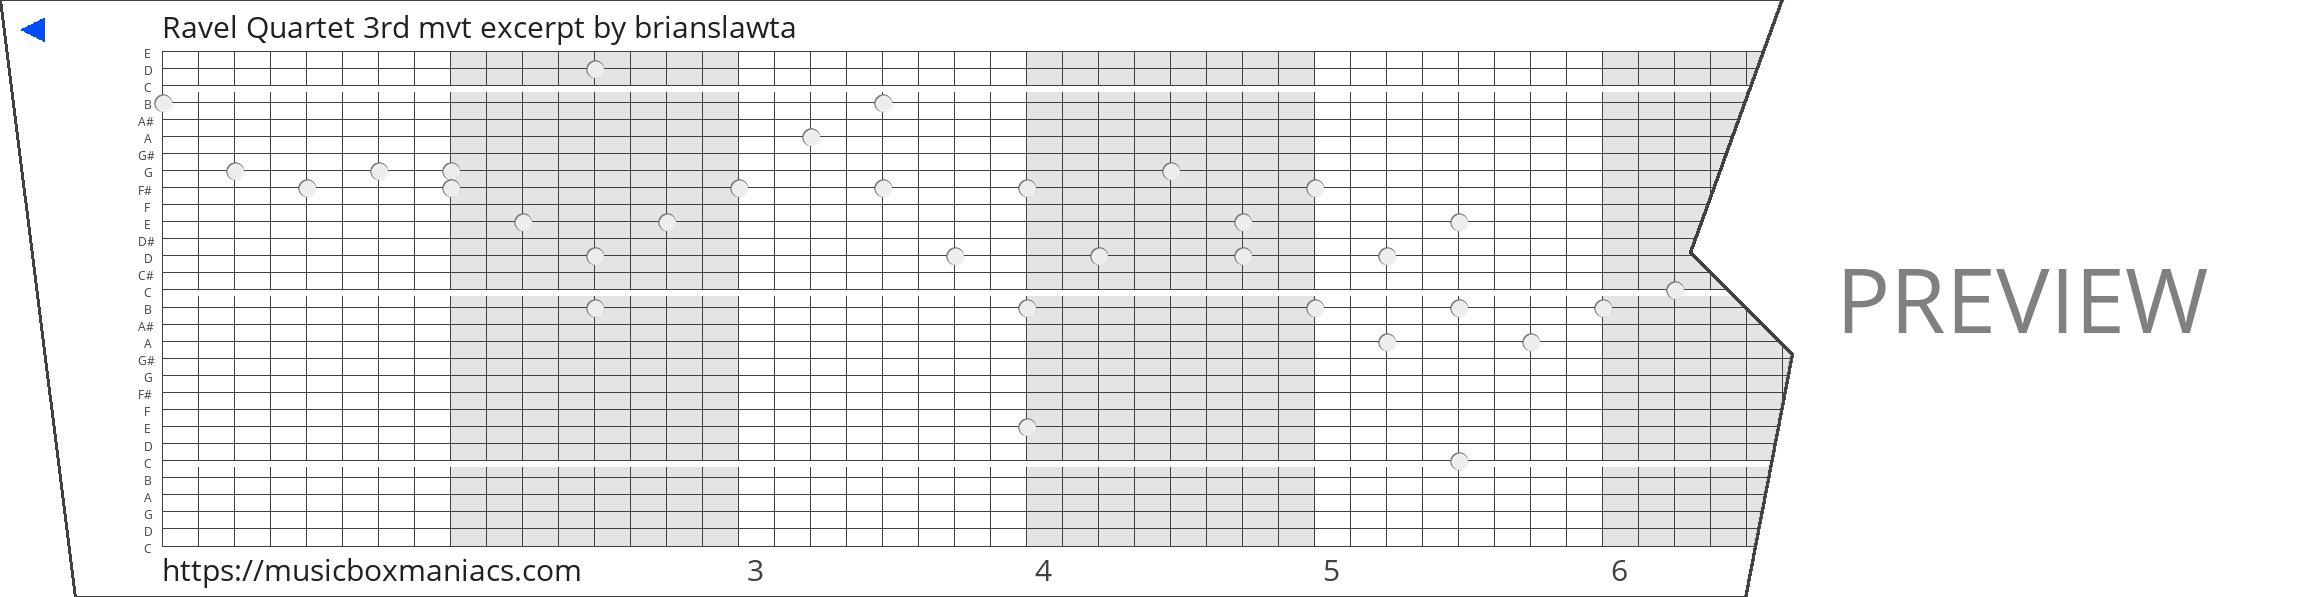 Ravel Quartet 3rd mvt excerpt 30 note music box paper strip